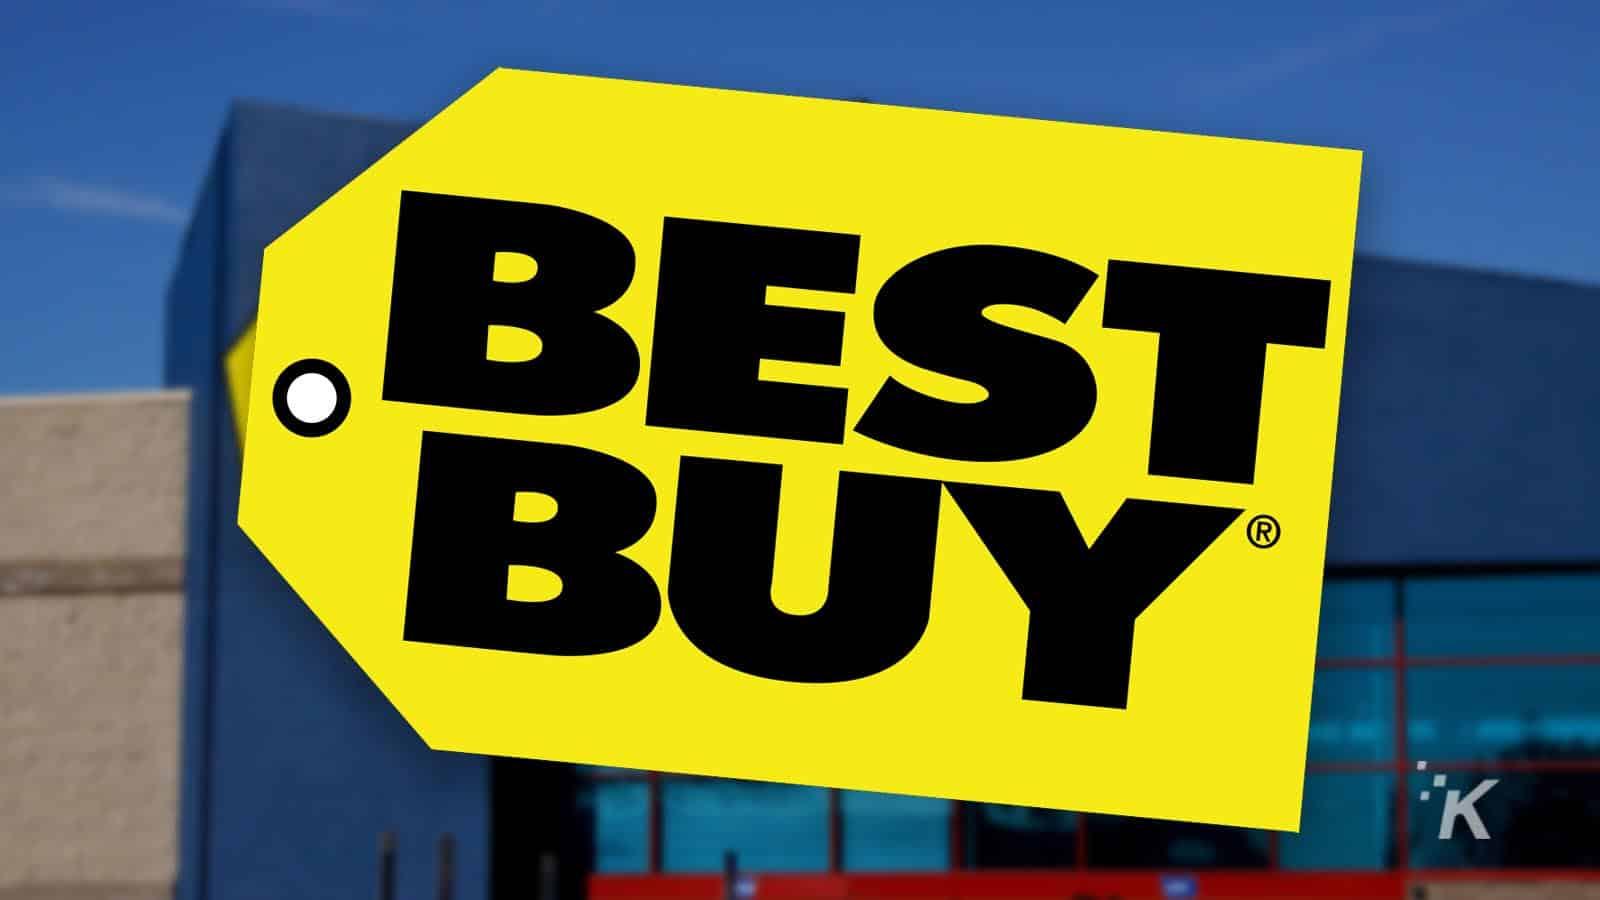 best buy logo on blurred background